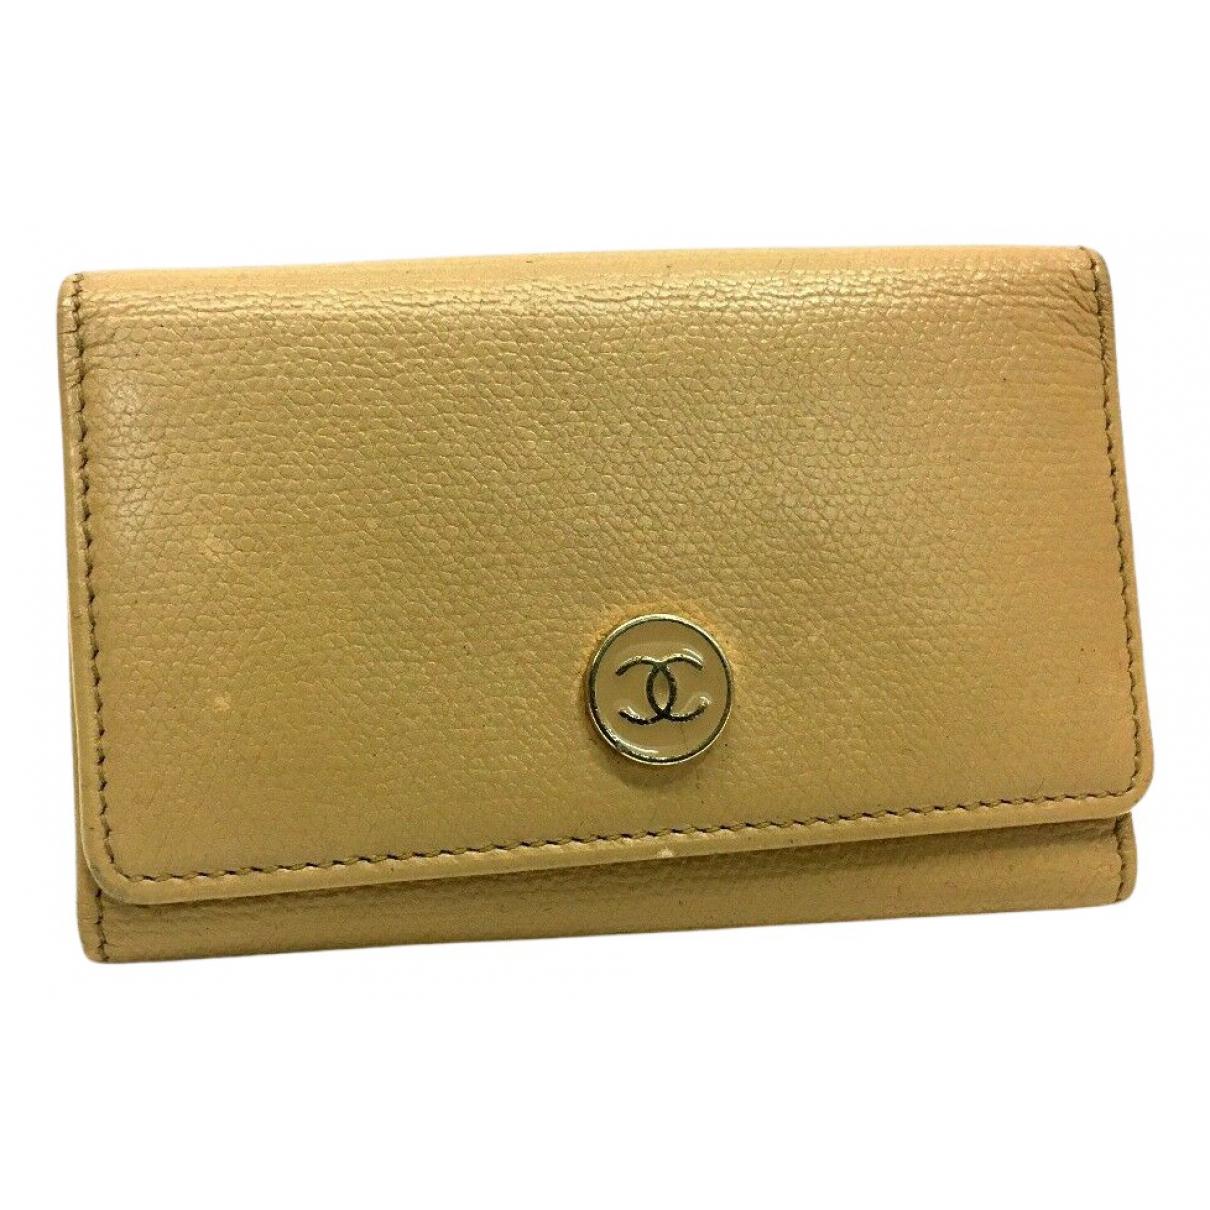 Chanel N Beige Leather Purses, wallet & cases for Women N